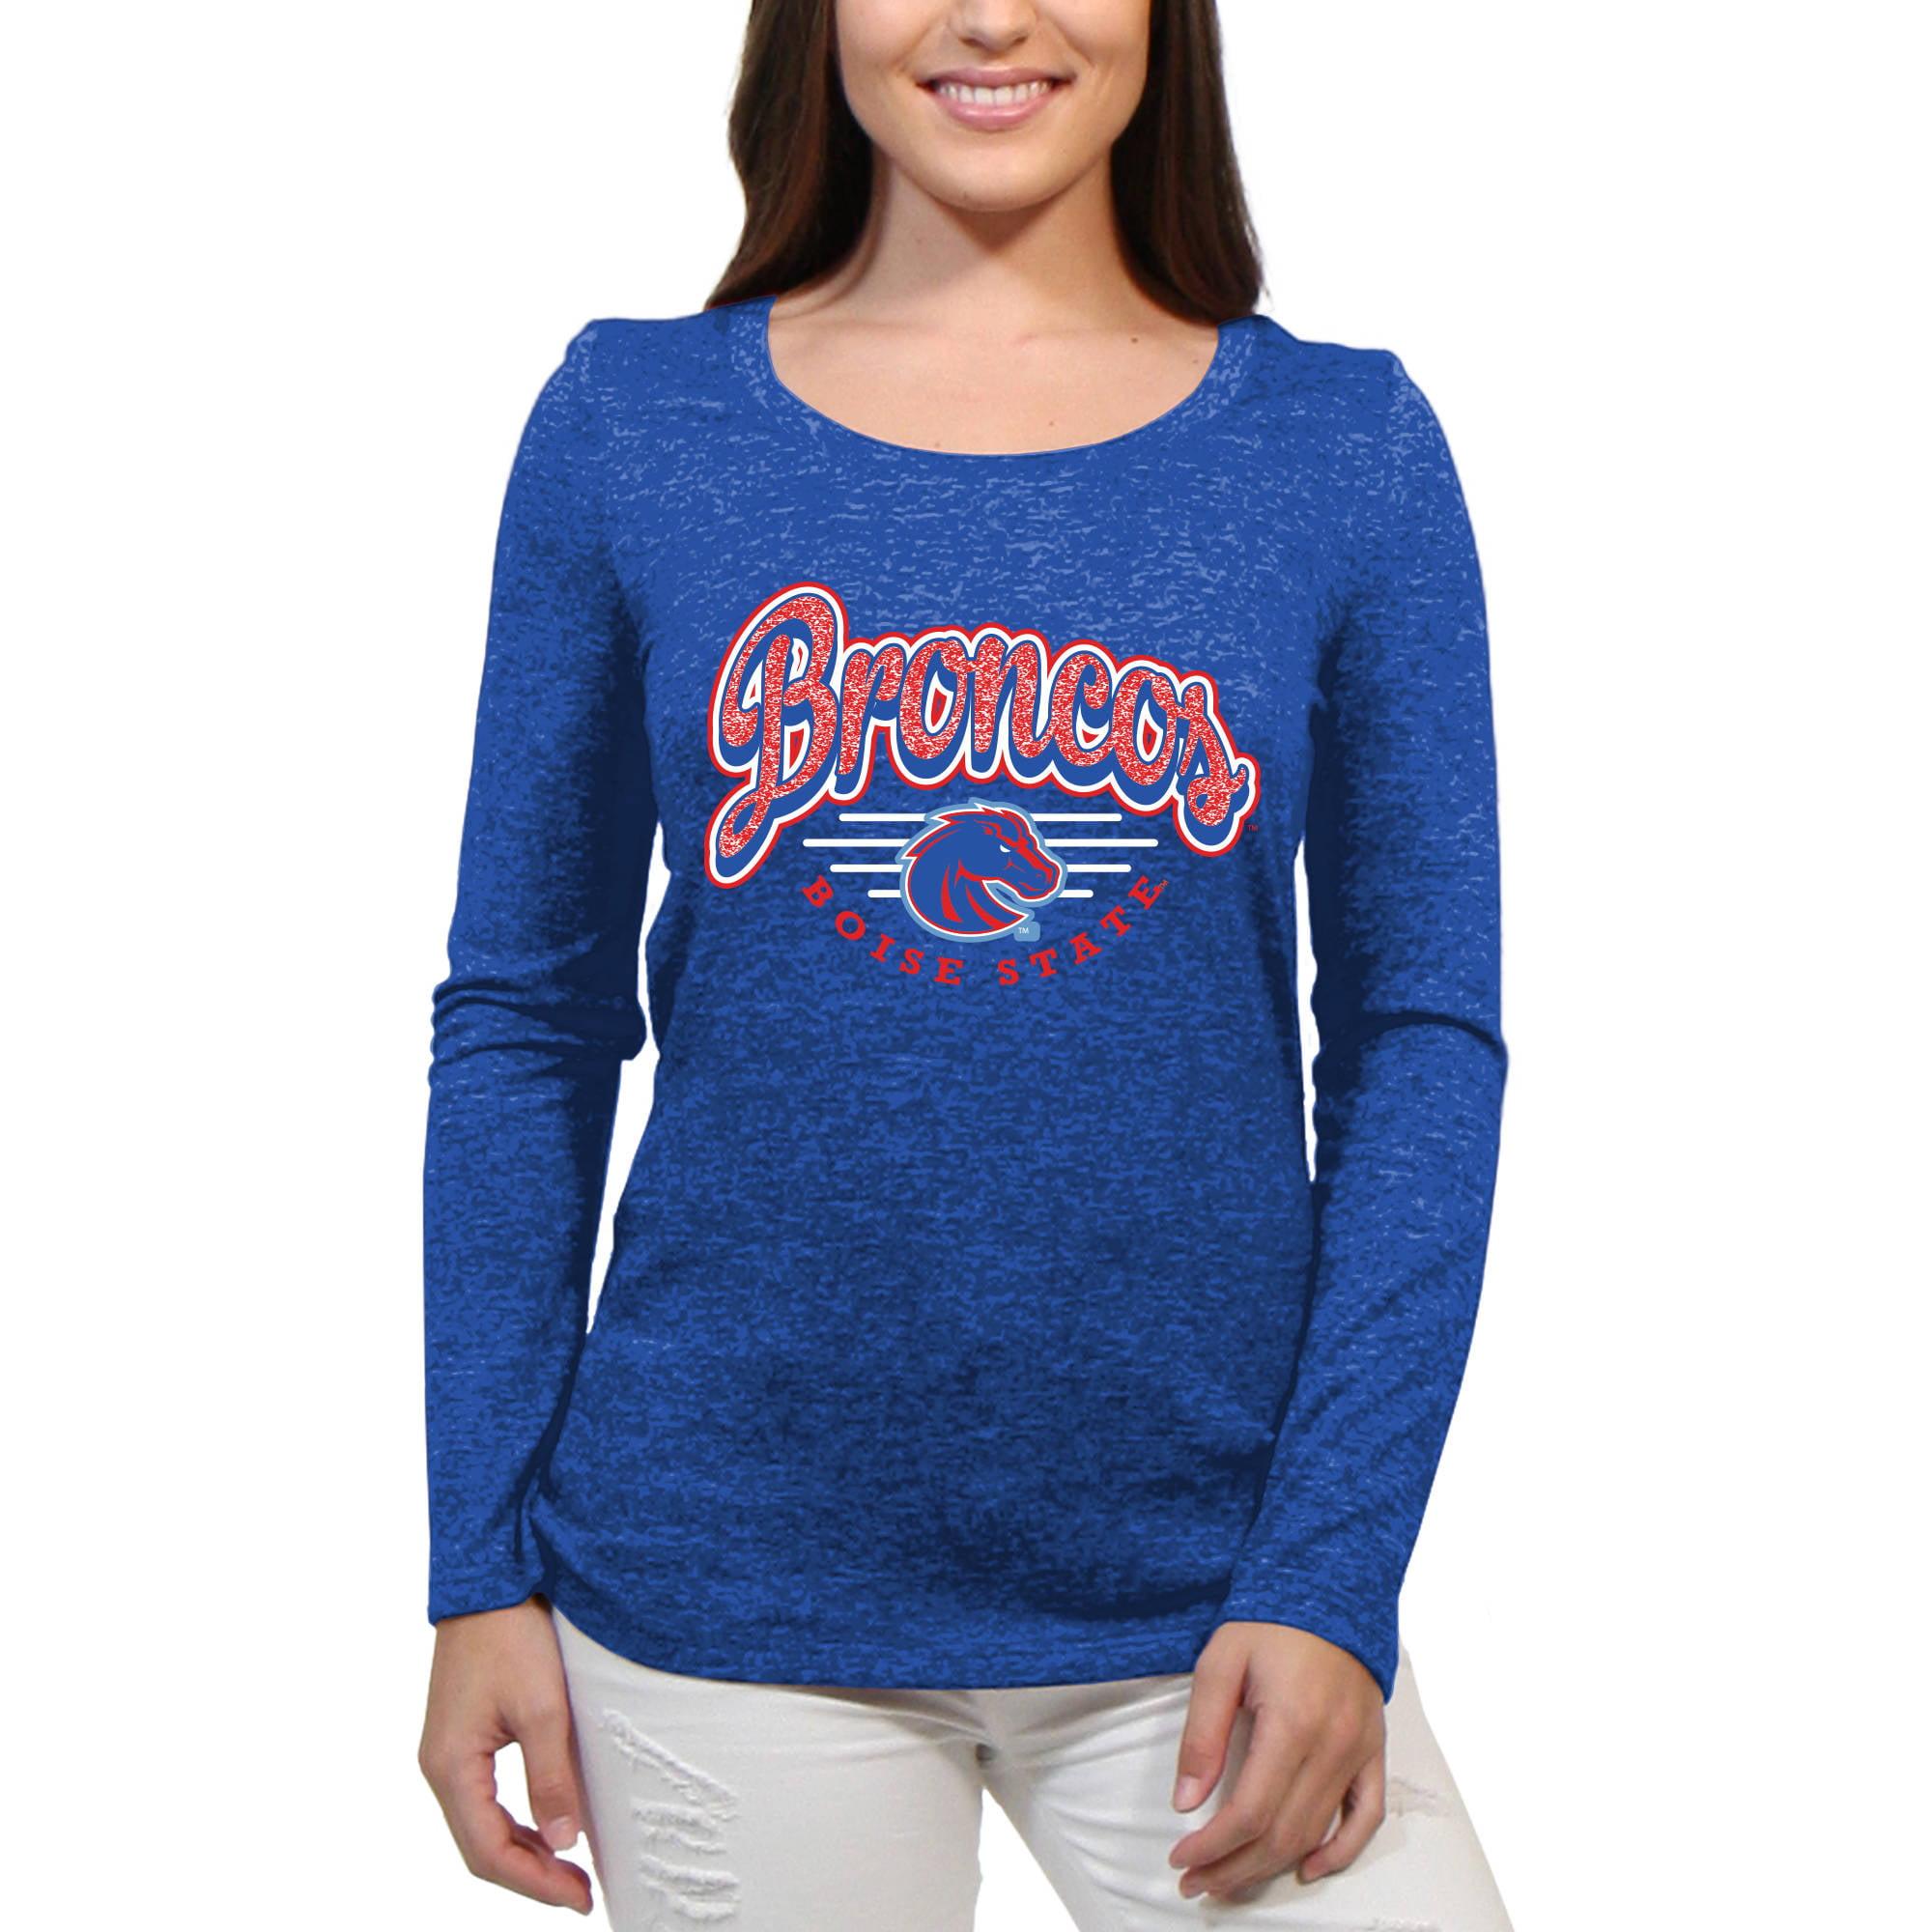 Boise State Broncos Funky Script Women'S/Juniors Team Long Sleeve Scoop Neck Shirt